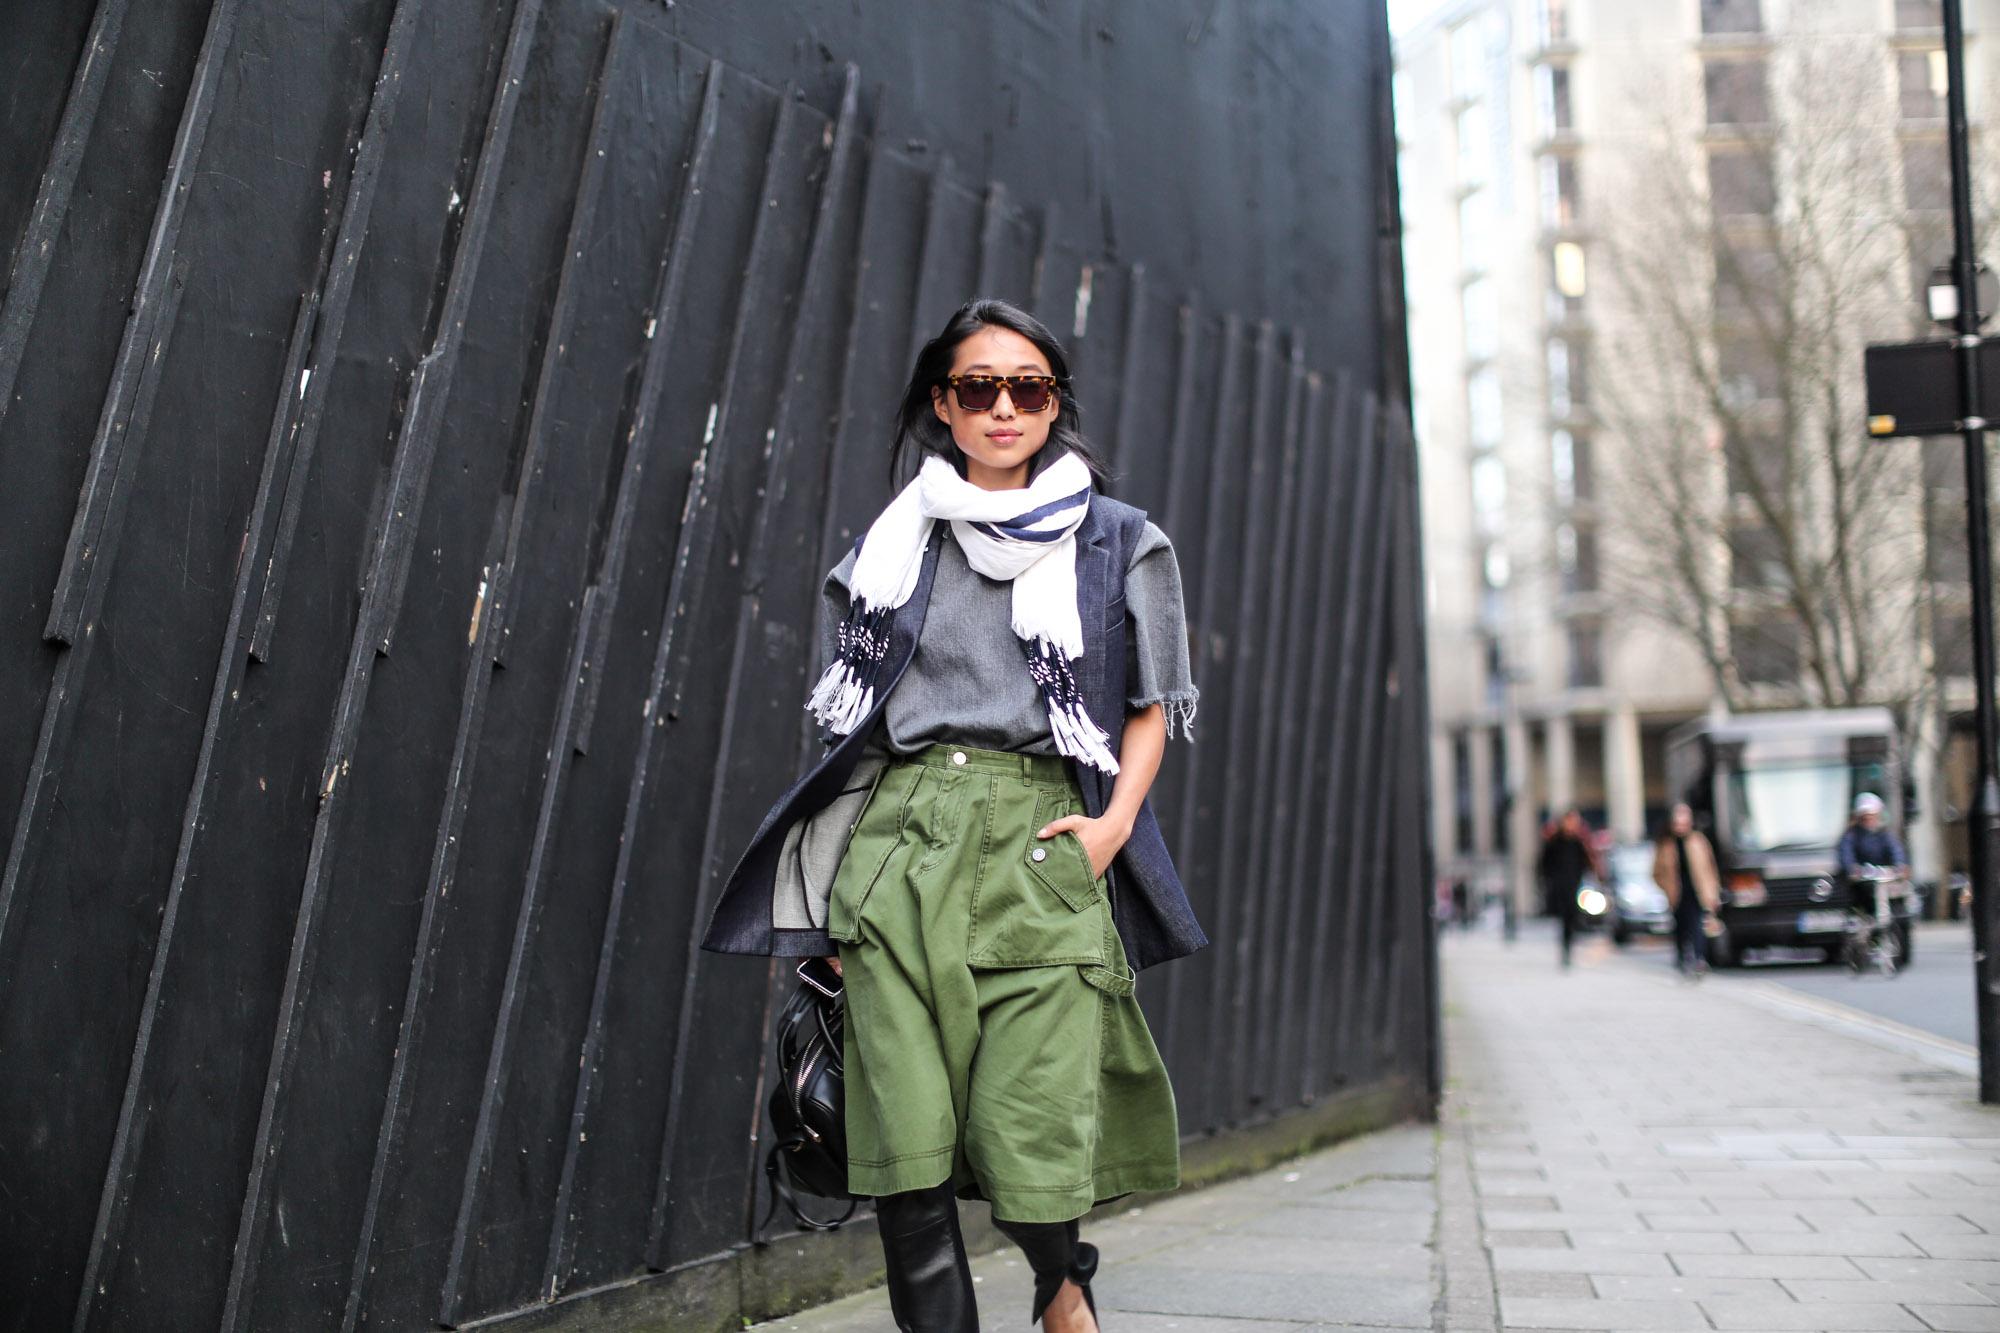 Clochet-london-fashion-week-streetstyle-burberry-22